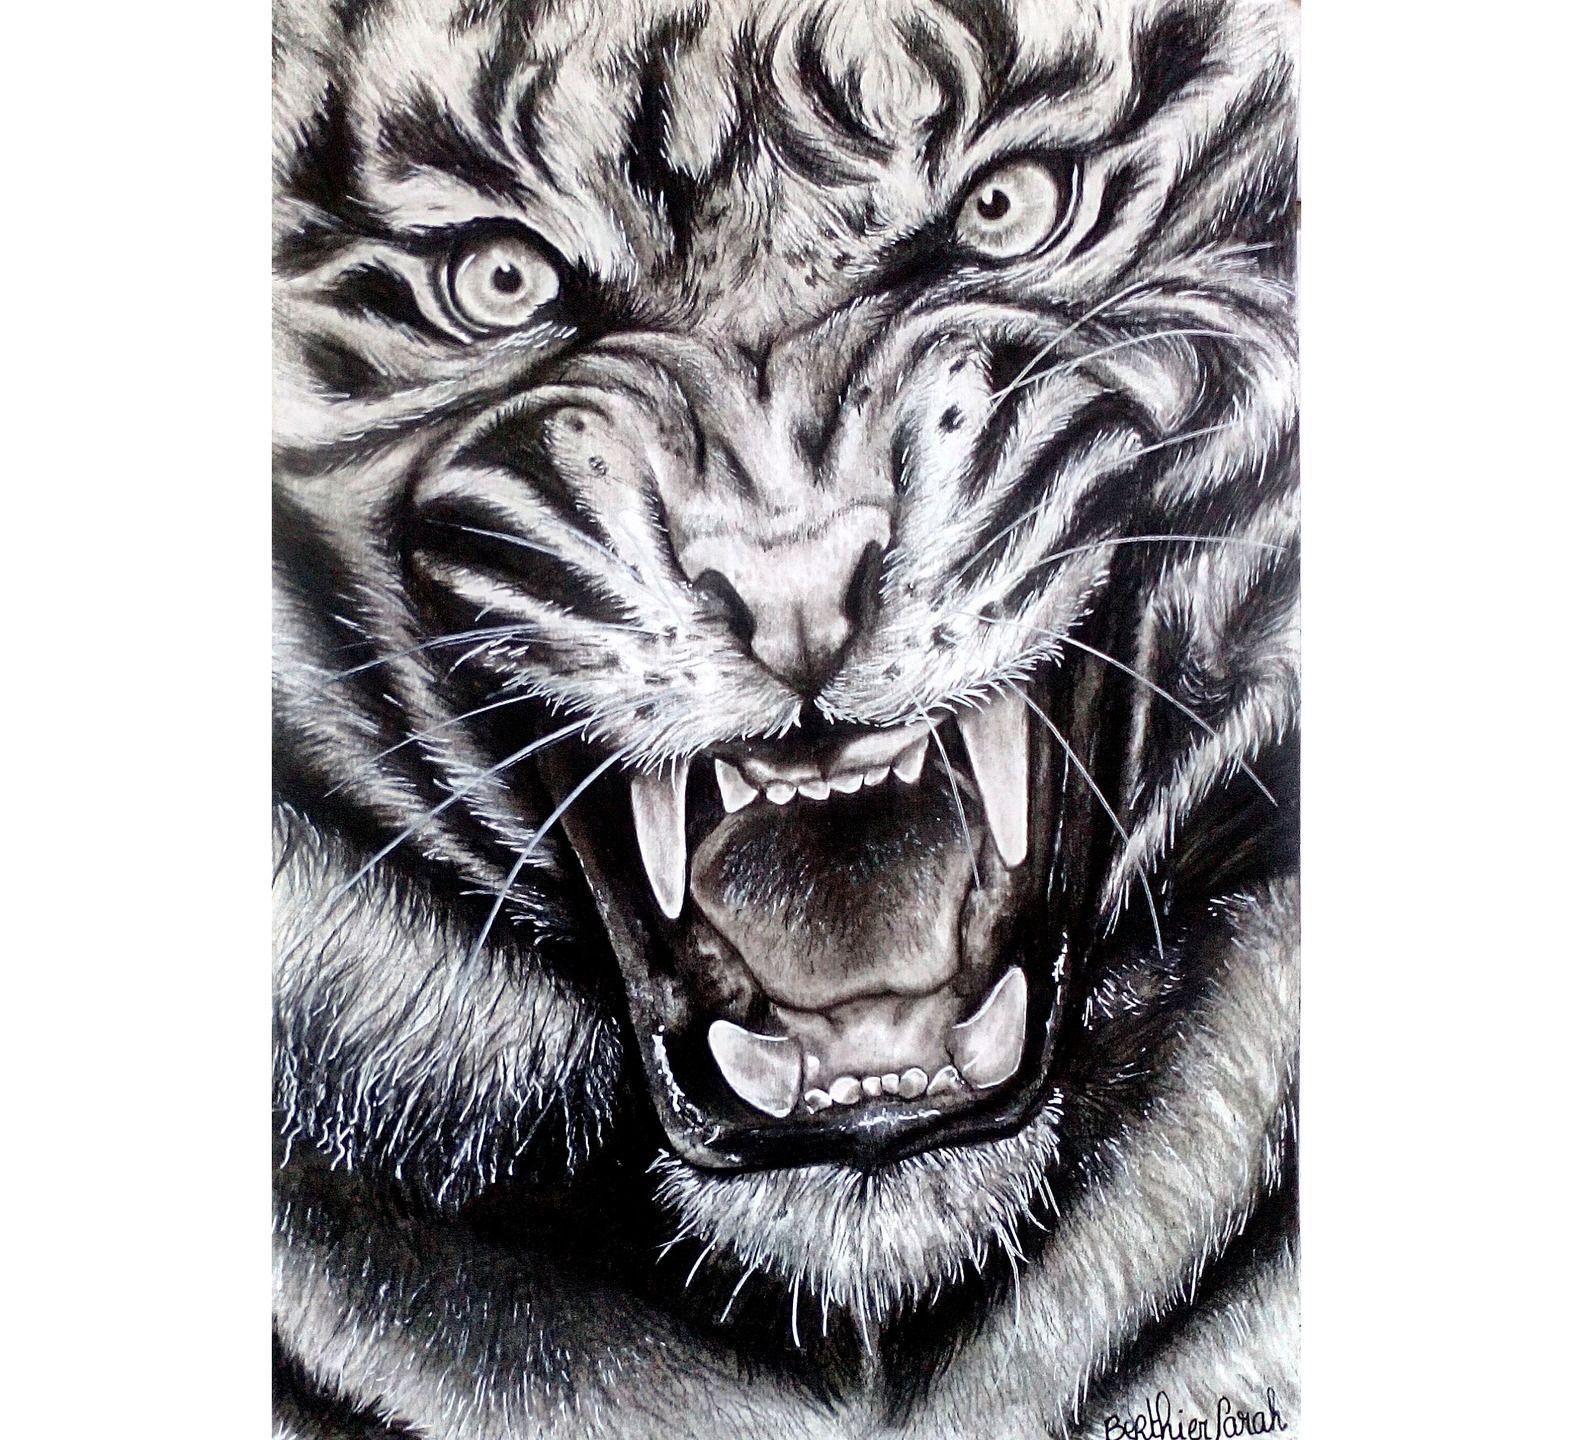 Dessin Realiste Dessin Tigre Rugissant Realiste Noir Et Blanc